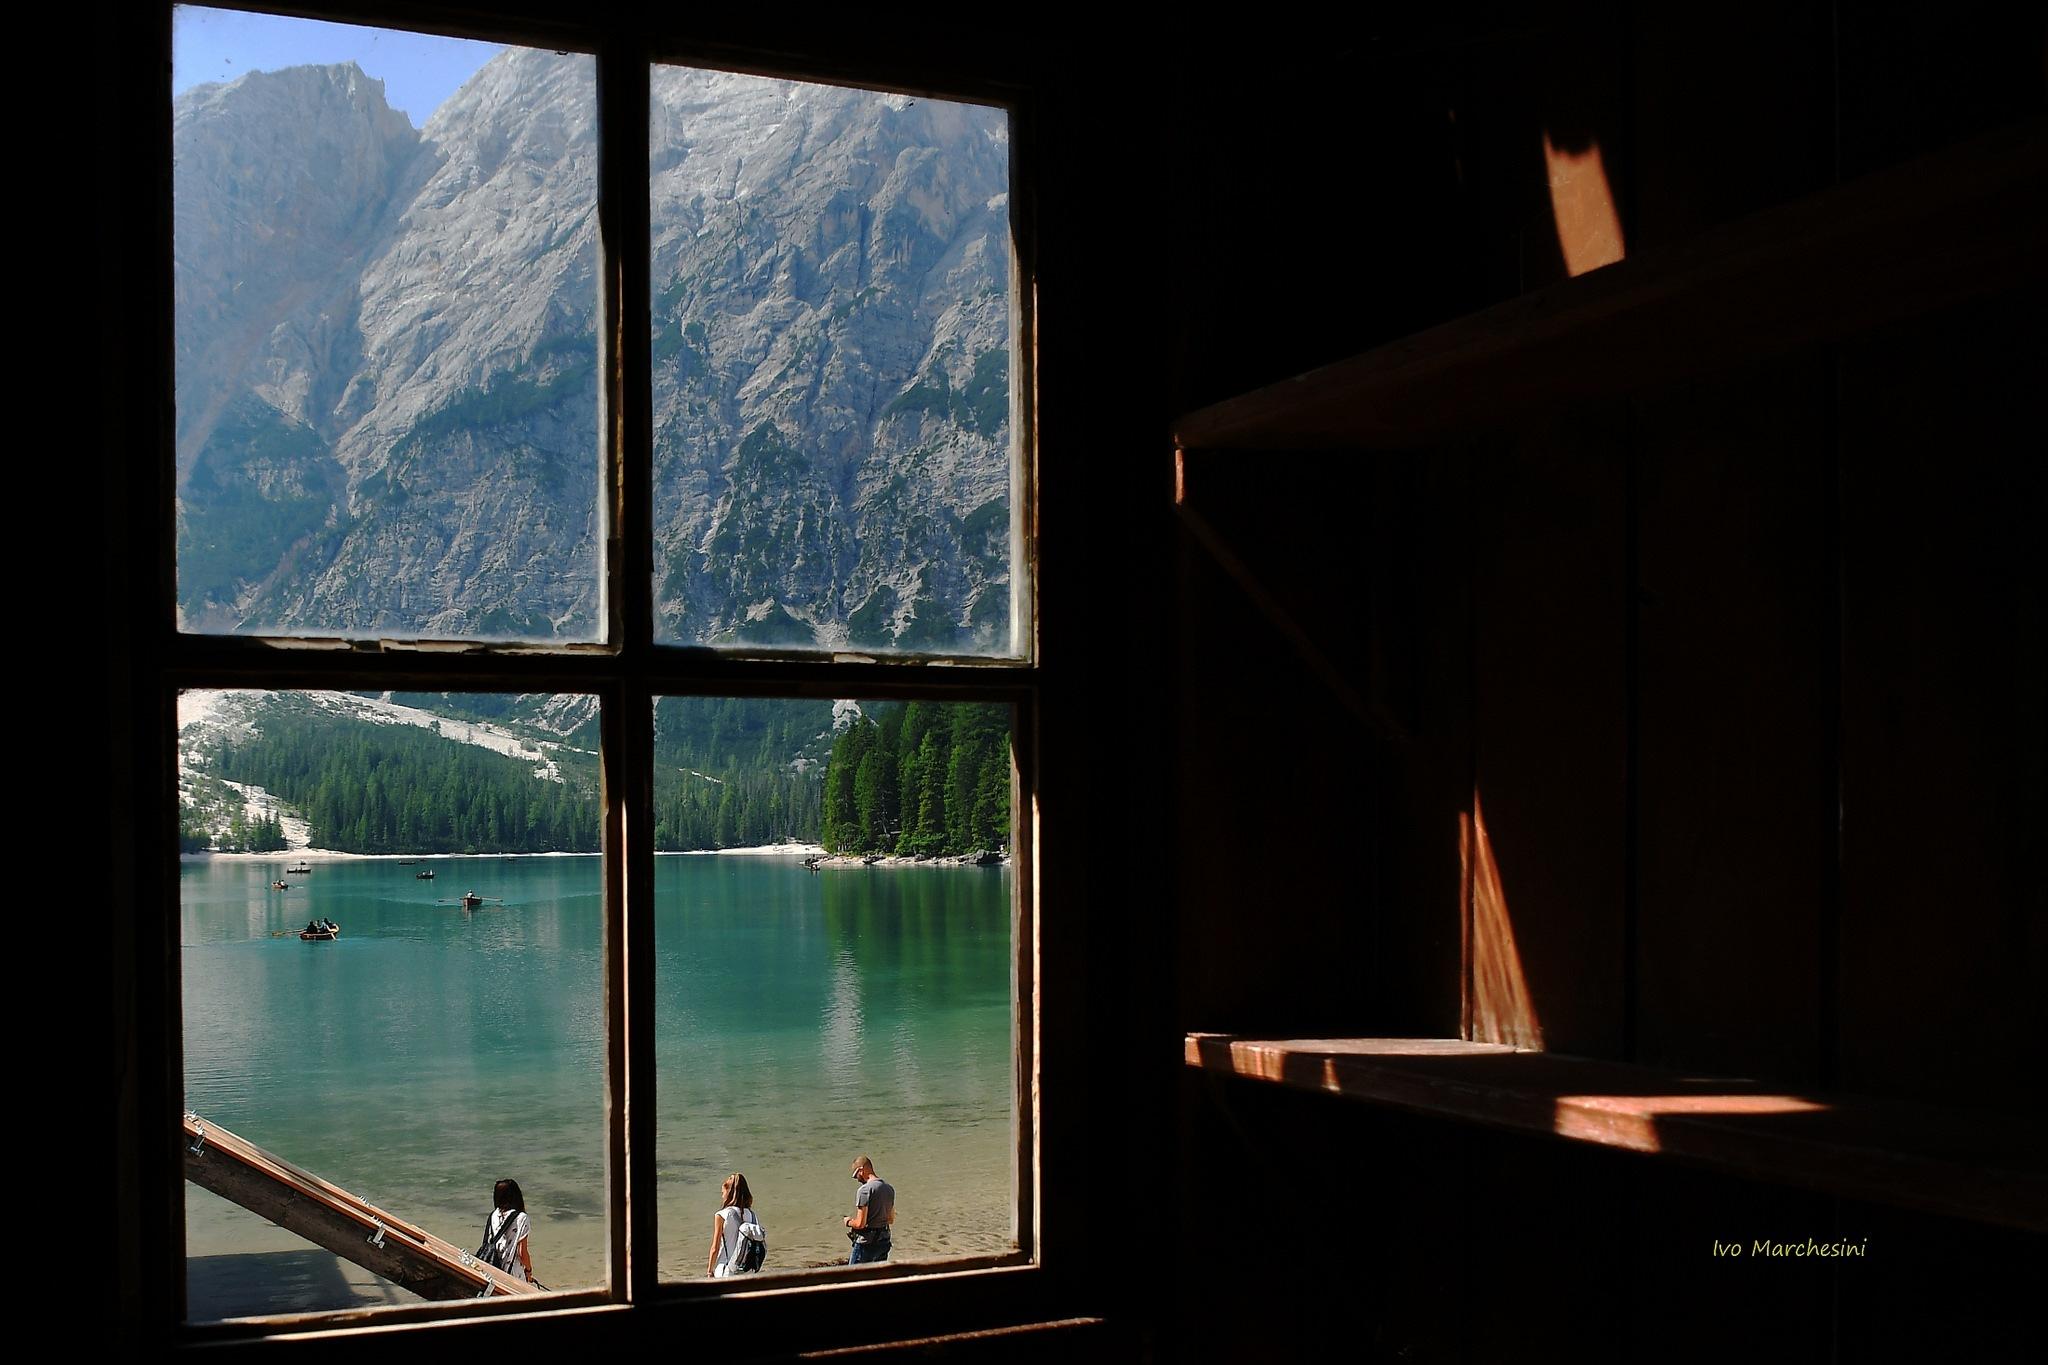 scorcio sul Lago... Braies by Ivo Mar Marchesini